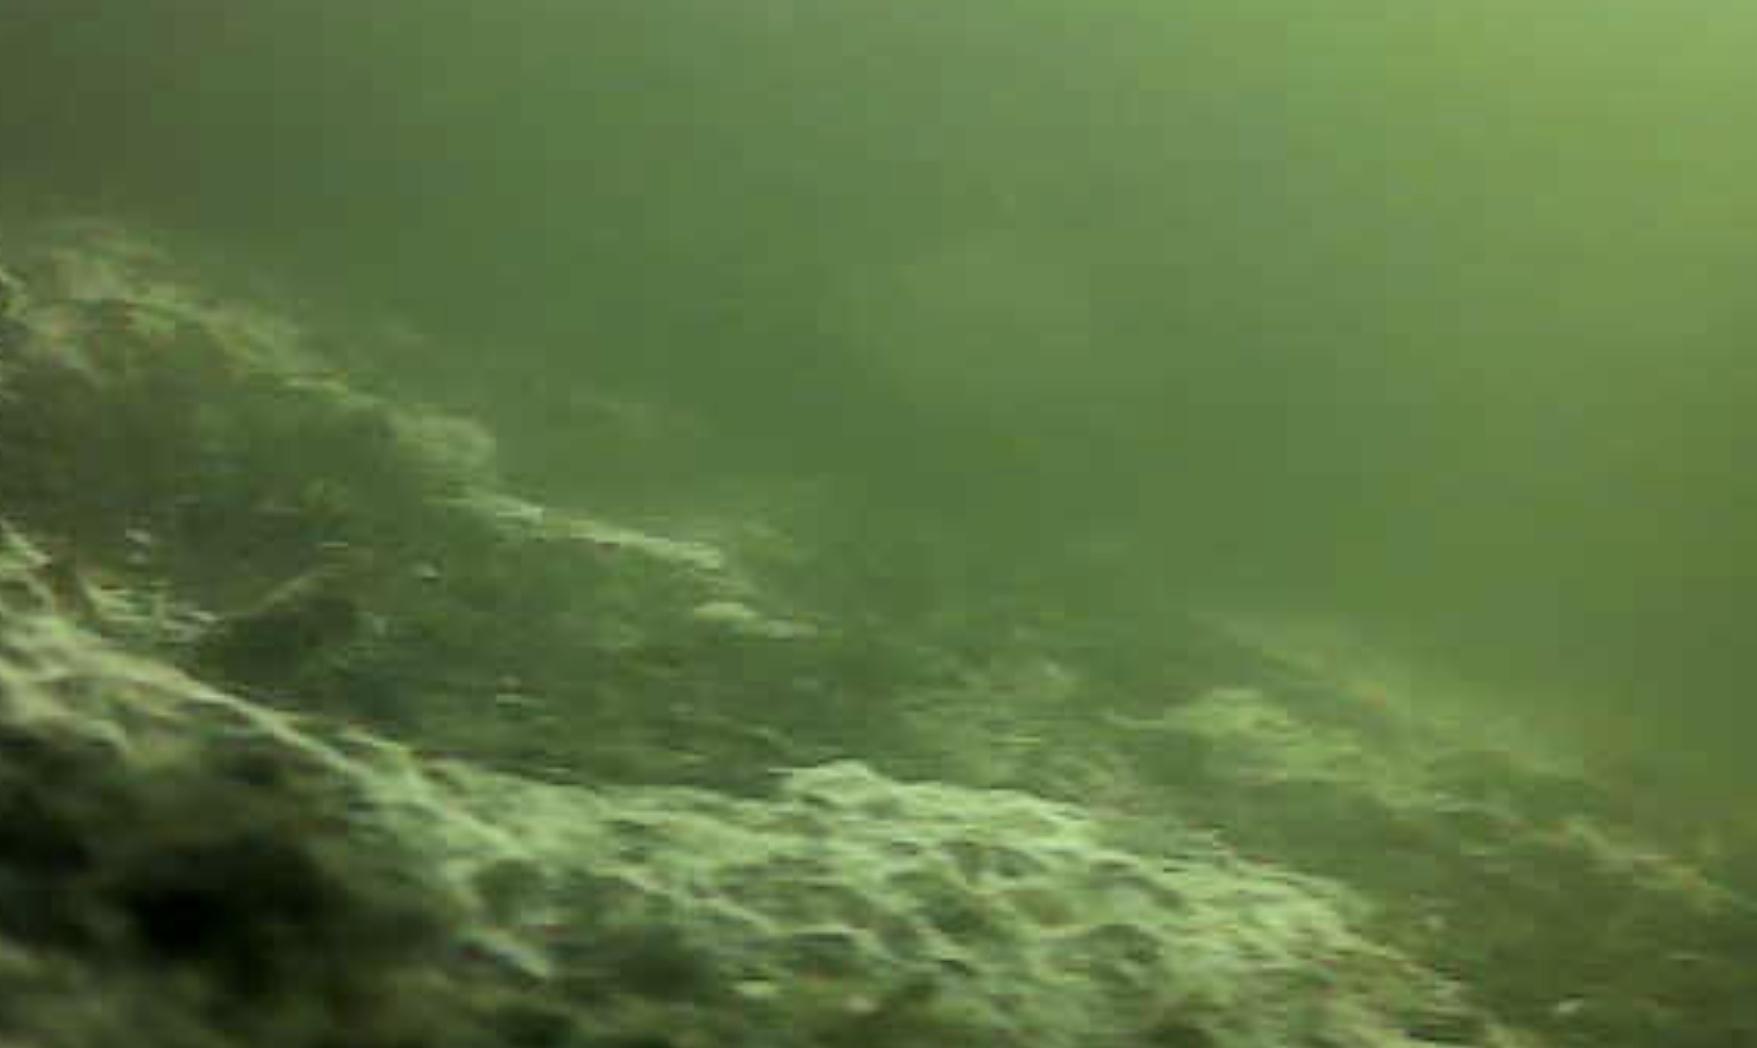 浜寺公園 水中写真 チヌ